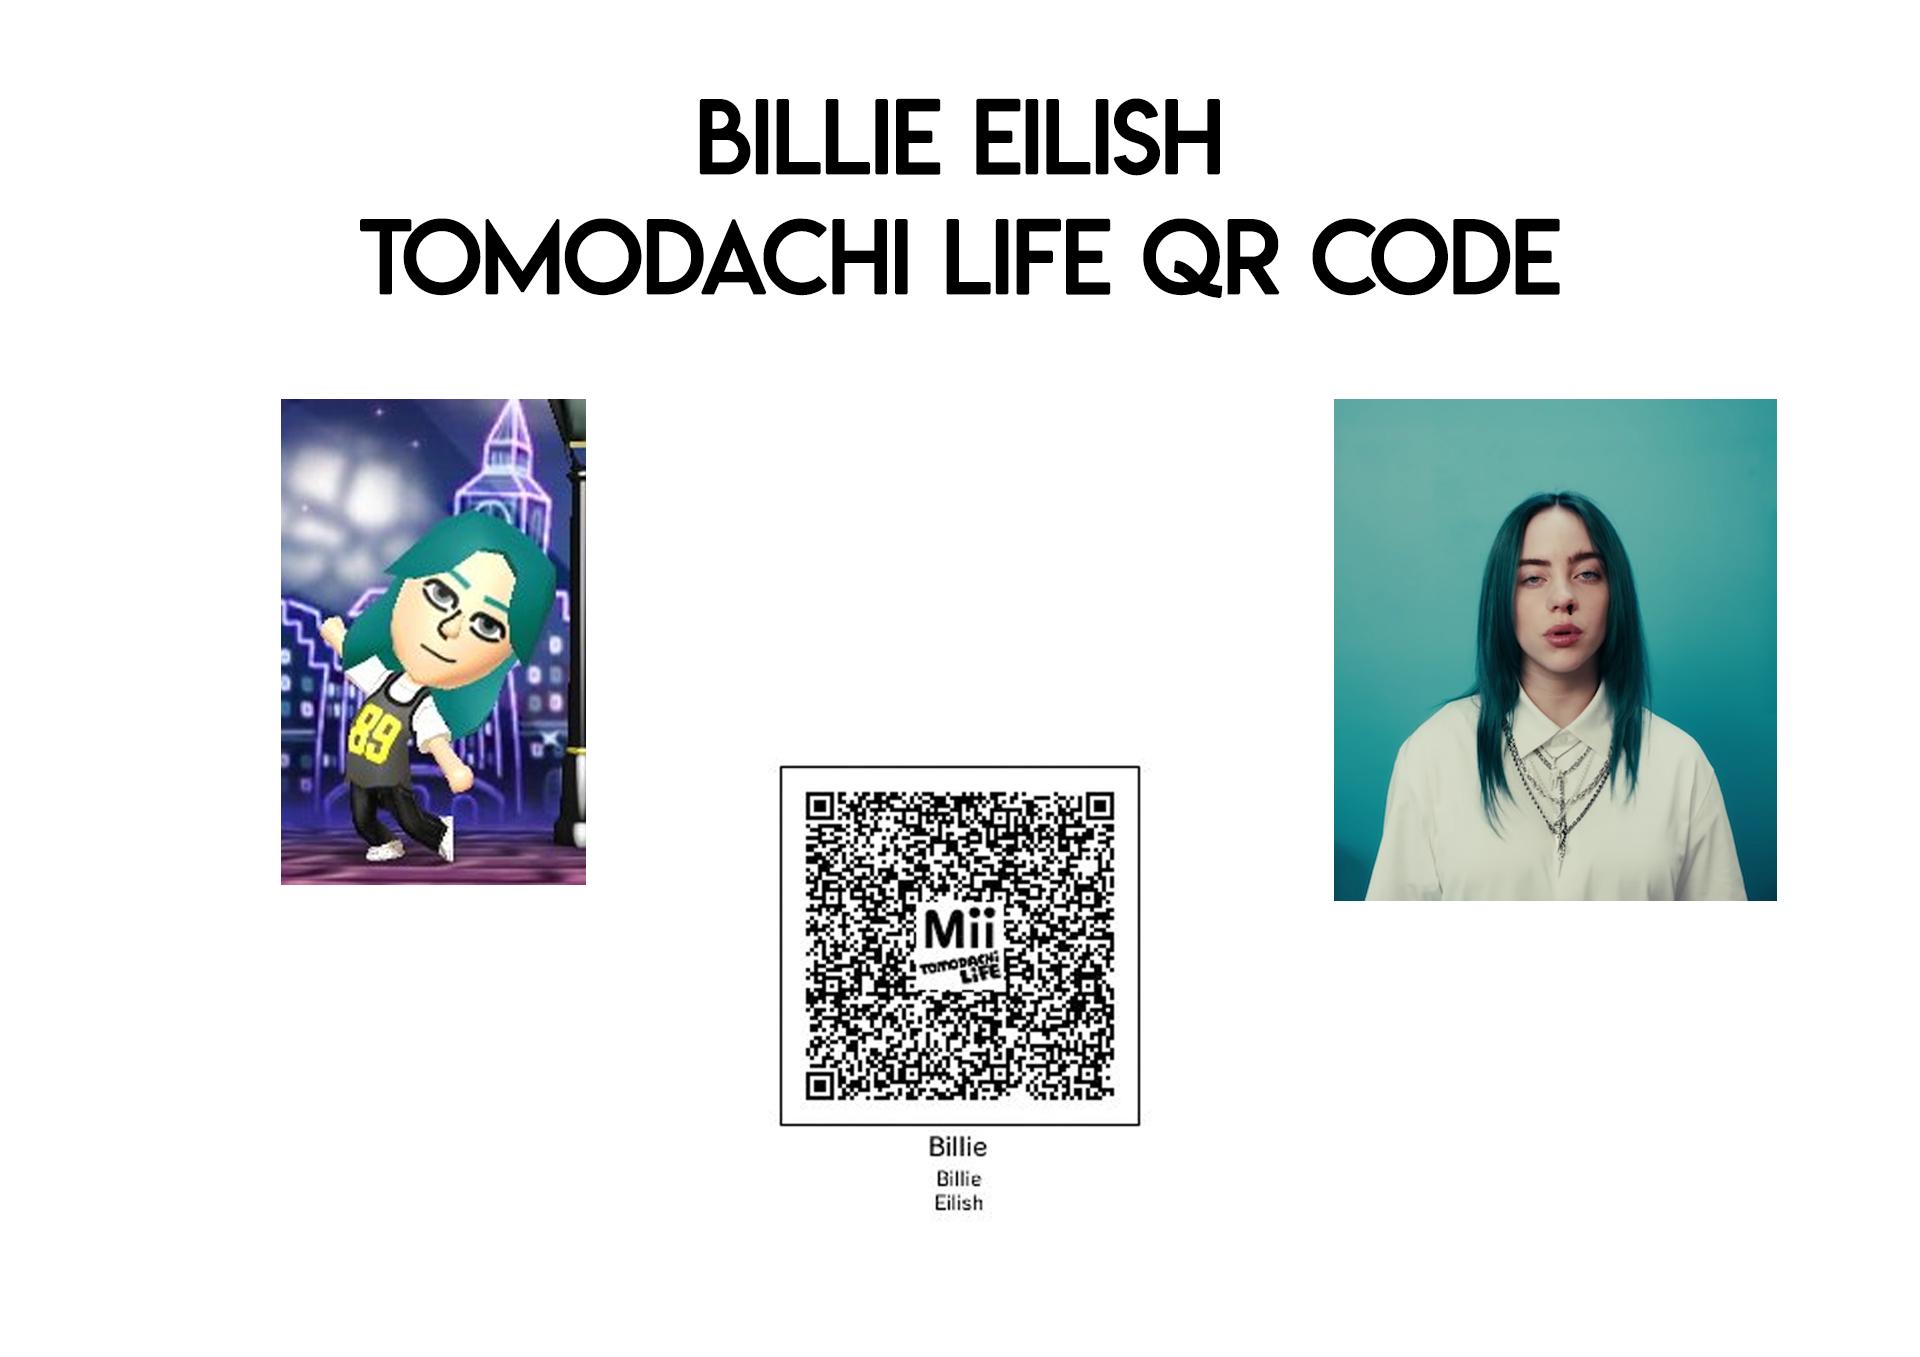 Life codes tomodachi Tomodachi Life/Cheats